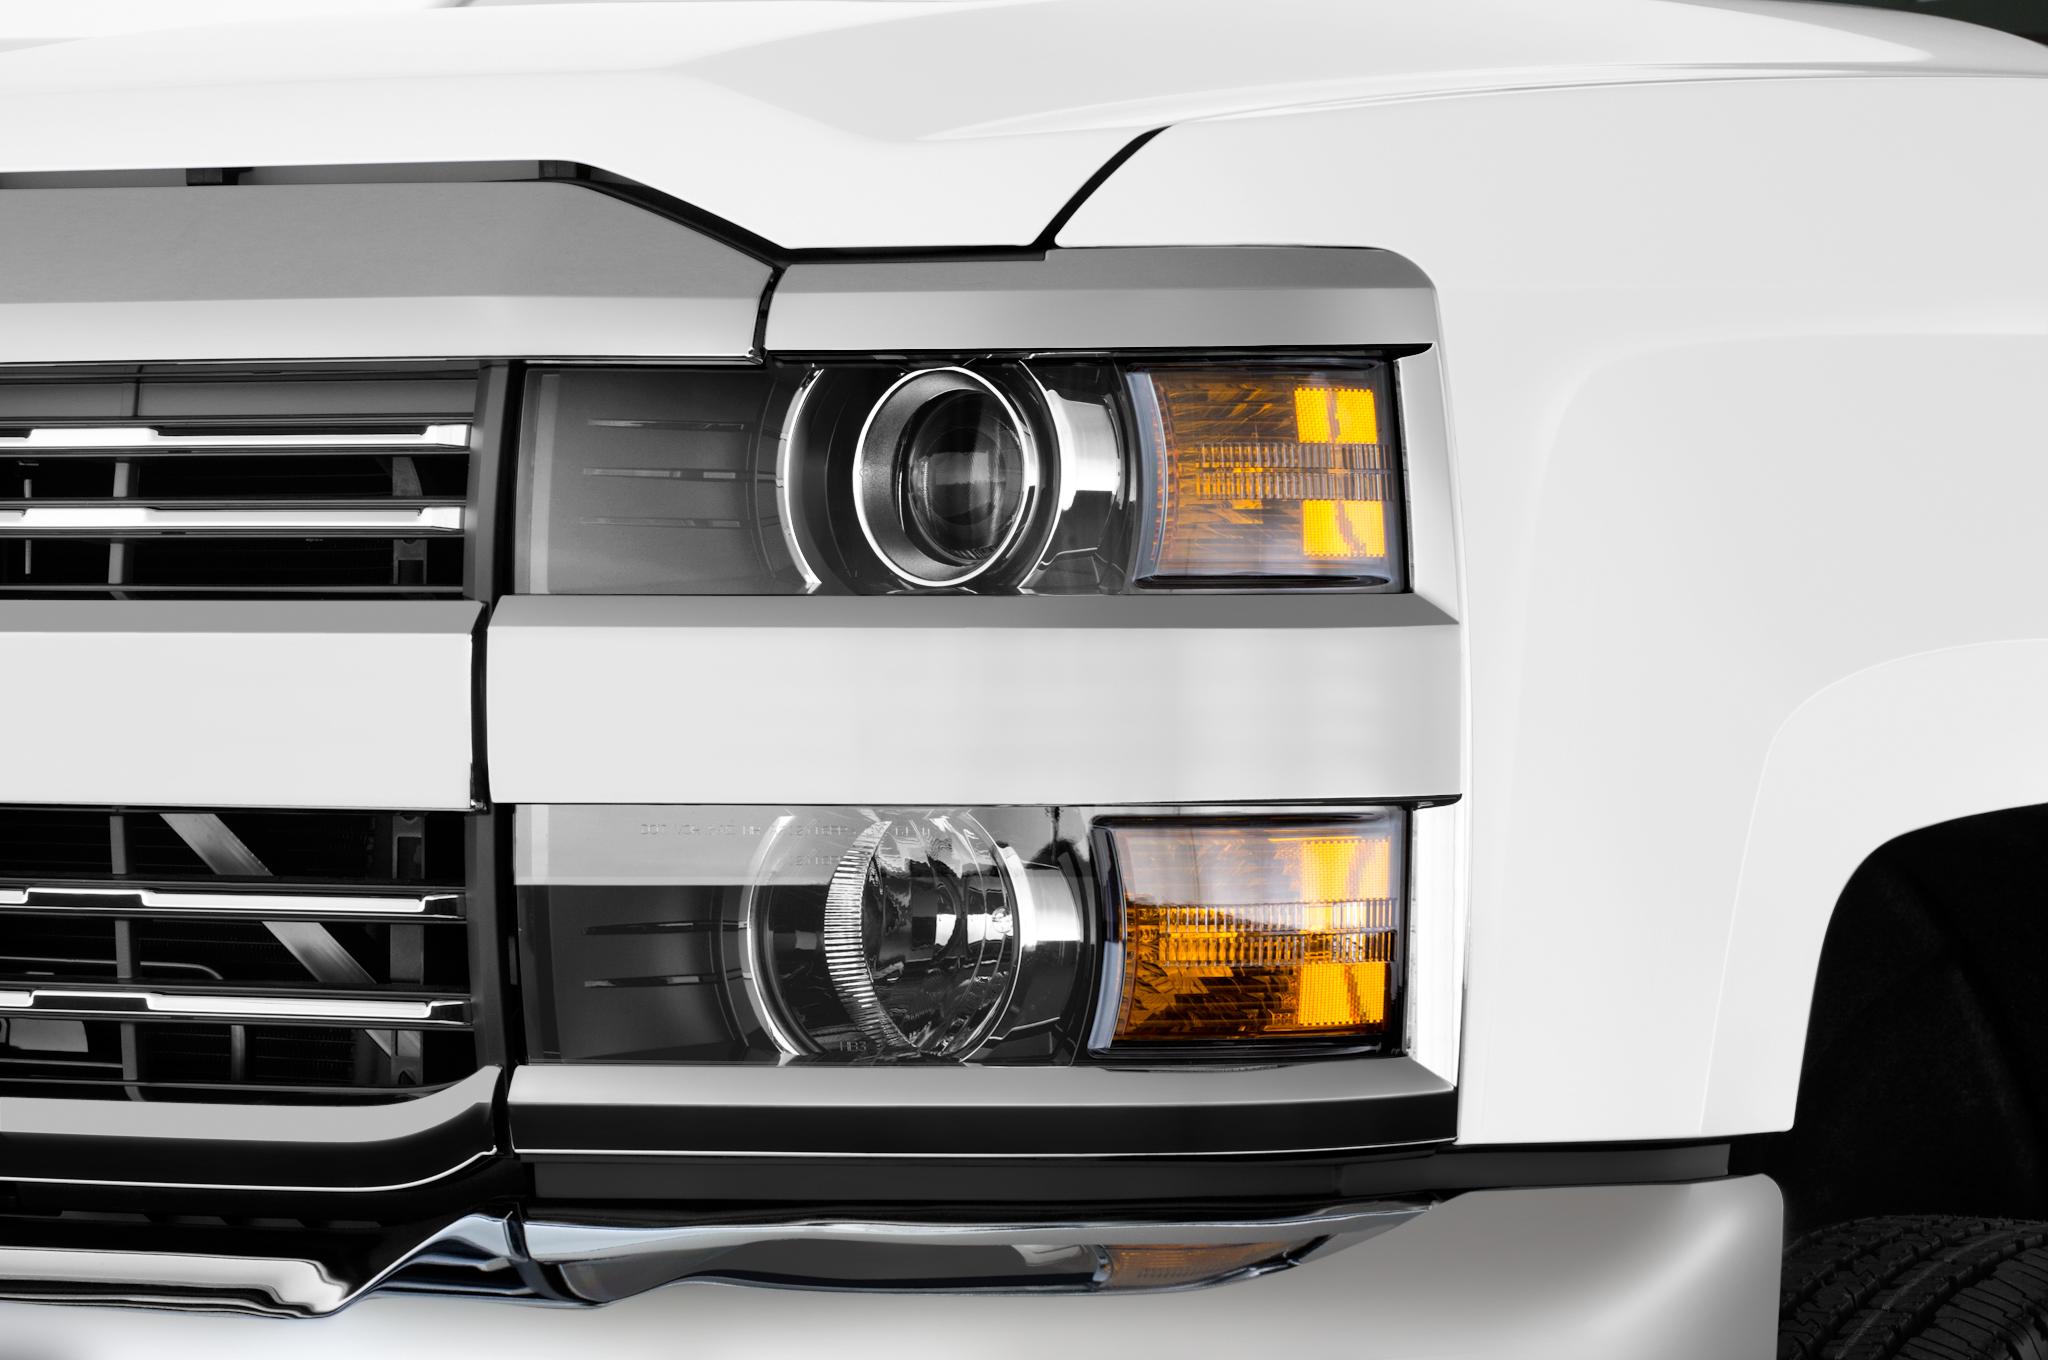 2017 Chevrolet Silverado Hd Adds Functional Ram Air Hood Scoop 2015 Chevy Fog Lights 46 116